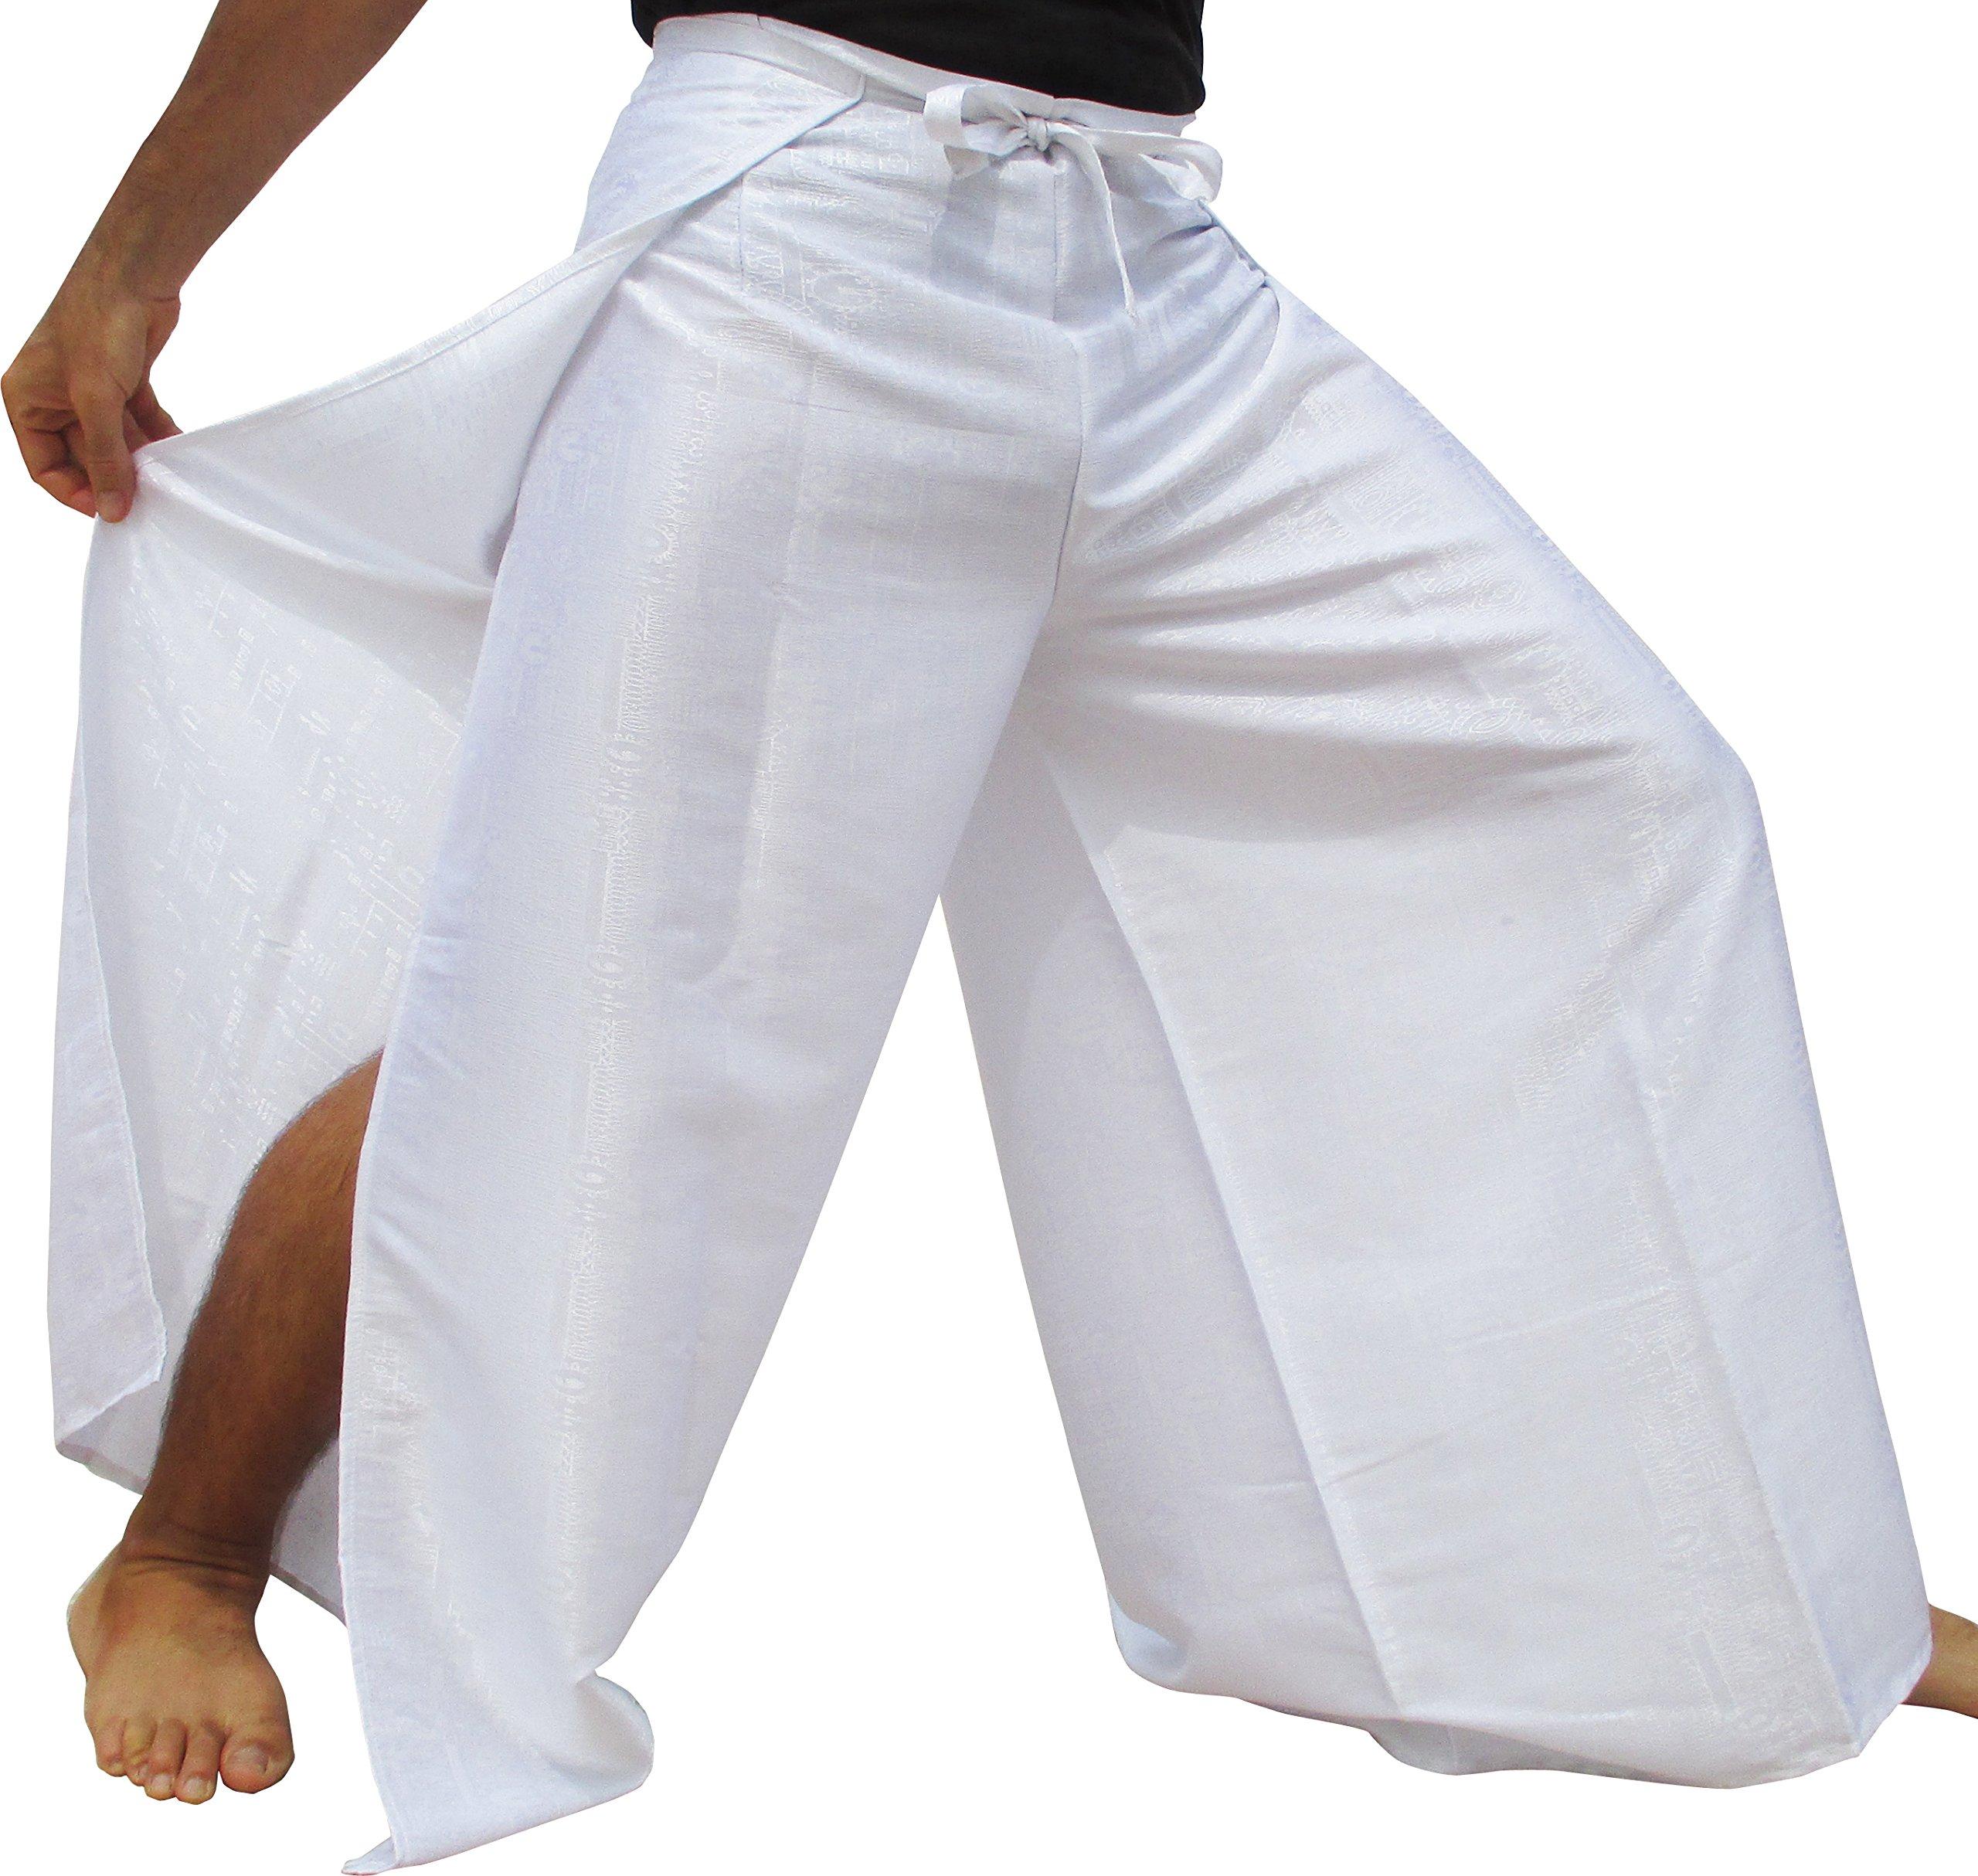 RaanPahMuang Brand Geometric Thick Textured Silk Drive in Wrap Pants, XX-Large, White by RaanPahMuang